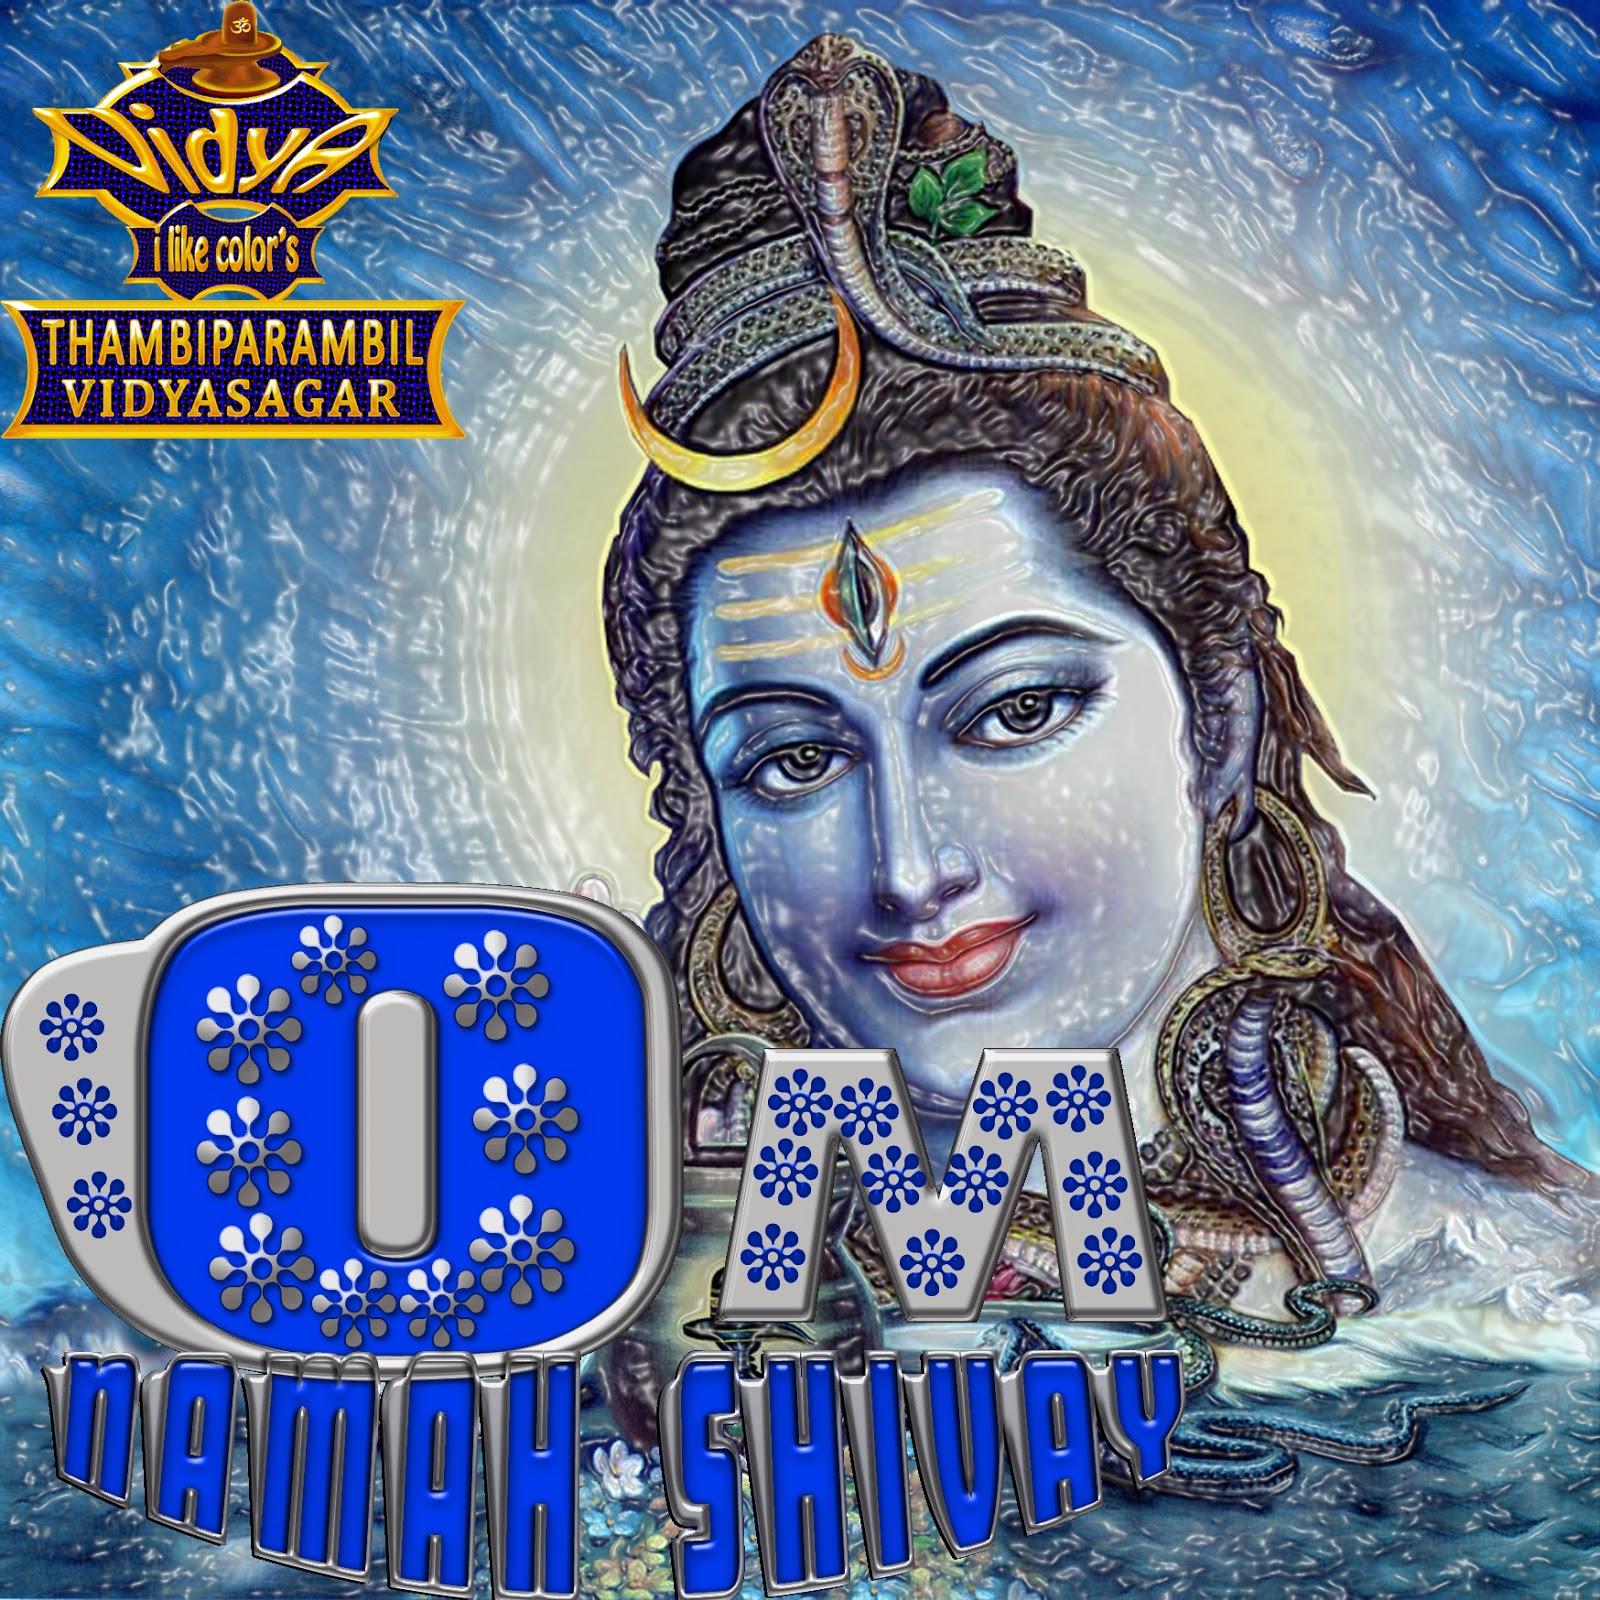 Ganesh Bhagwan Hd Wallpaper Bhagwan Ji Help Me Mahadev Shiv Shankar Bhagwan Ji